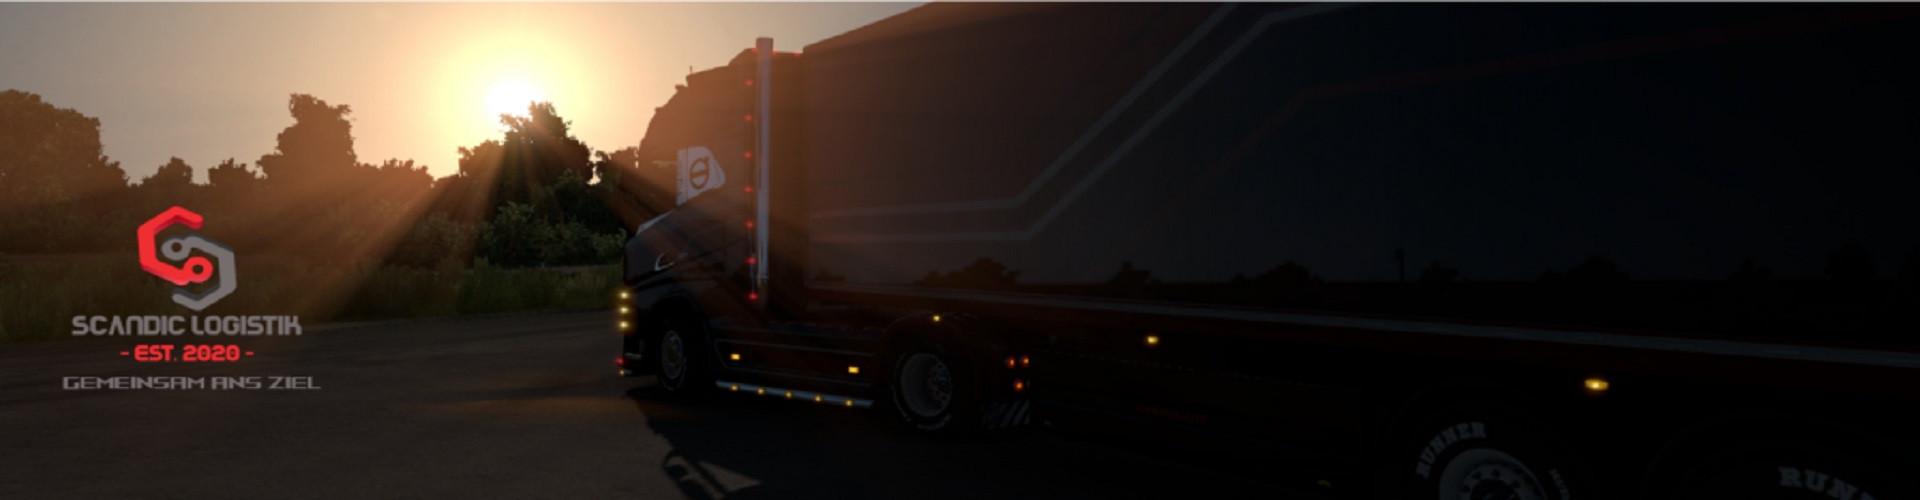 1 Jahr Scandic-Logistik